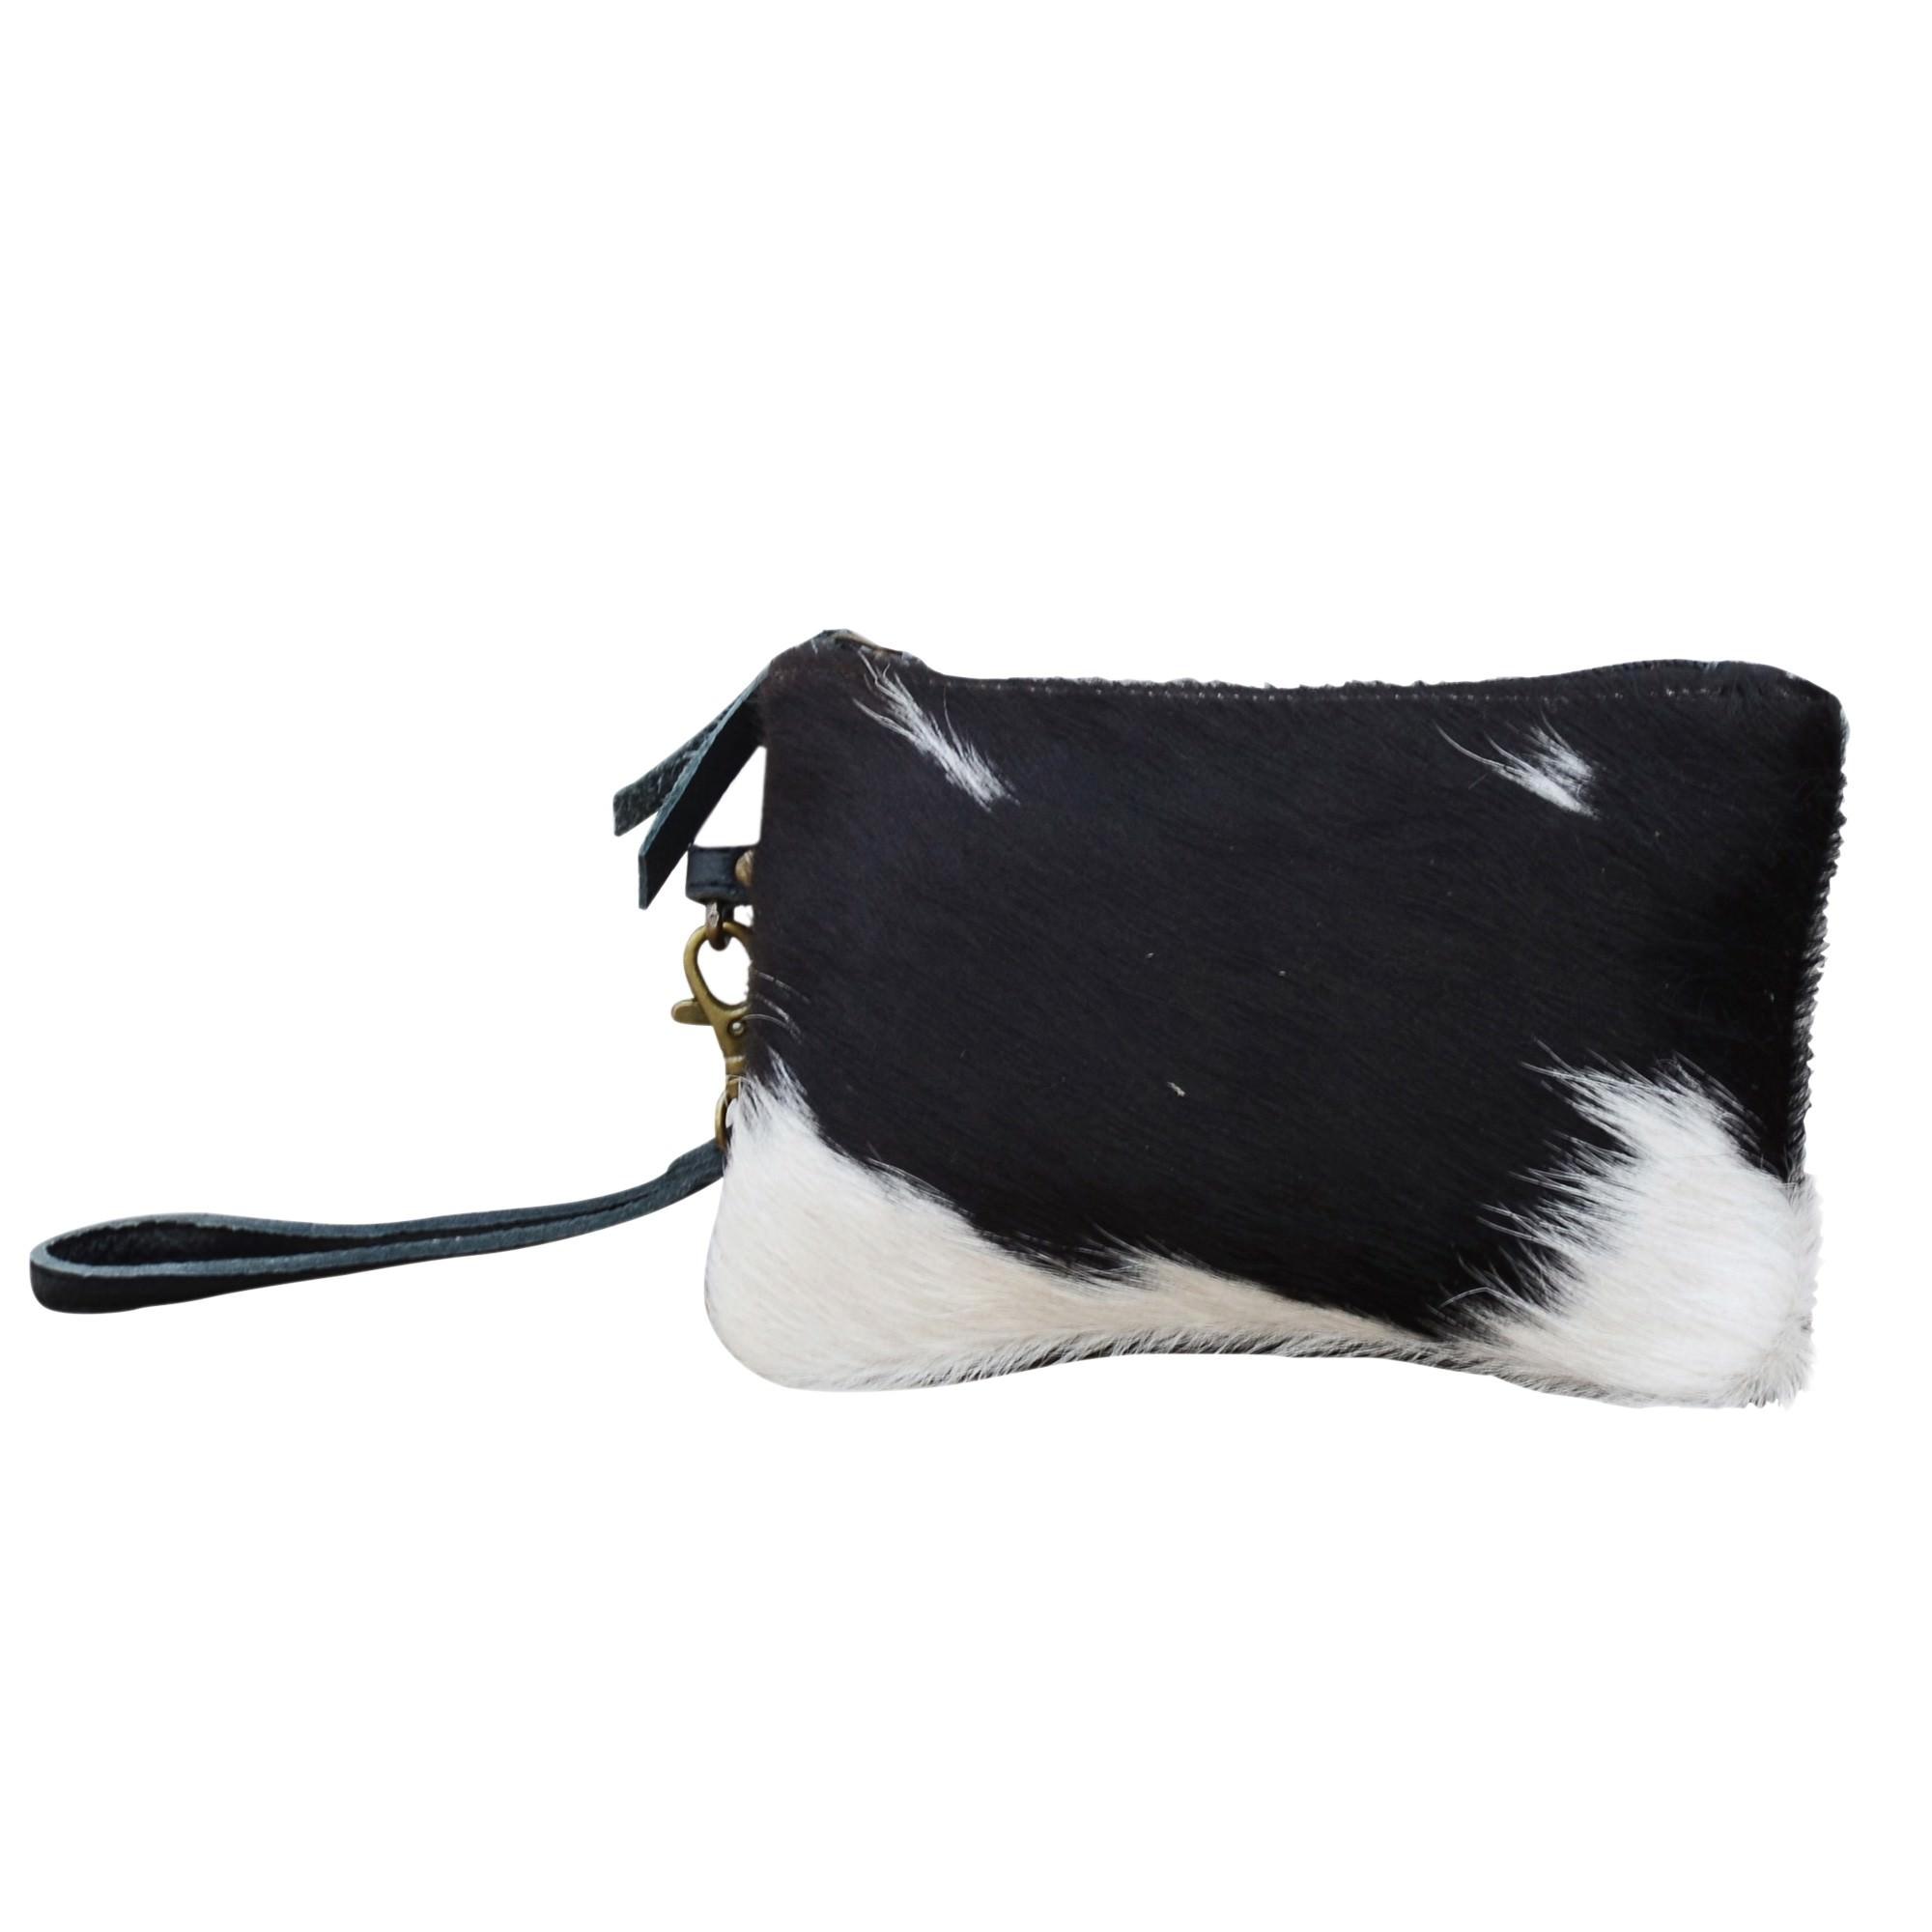 Irene Leather & Cowhide Wristlet Bag